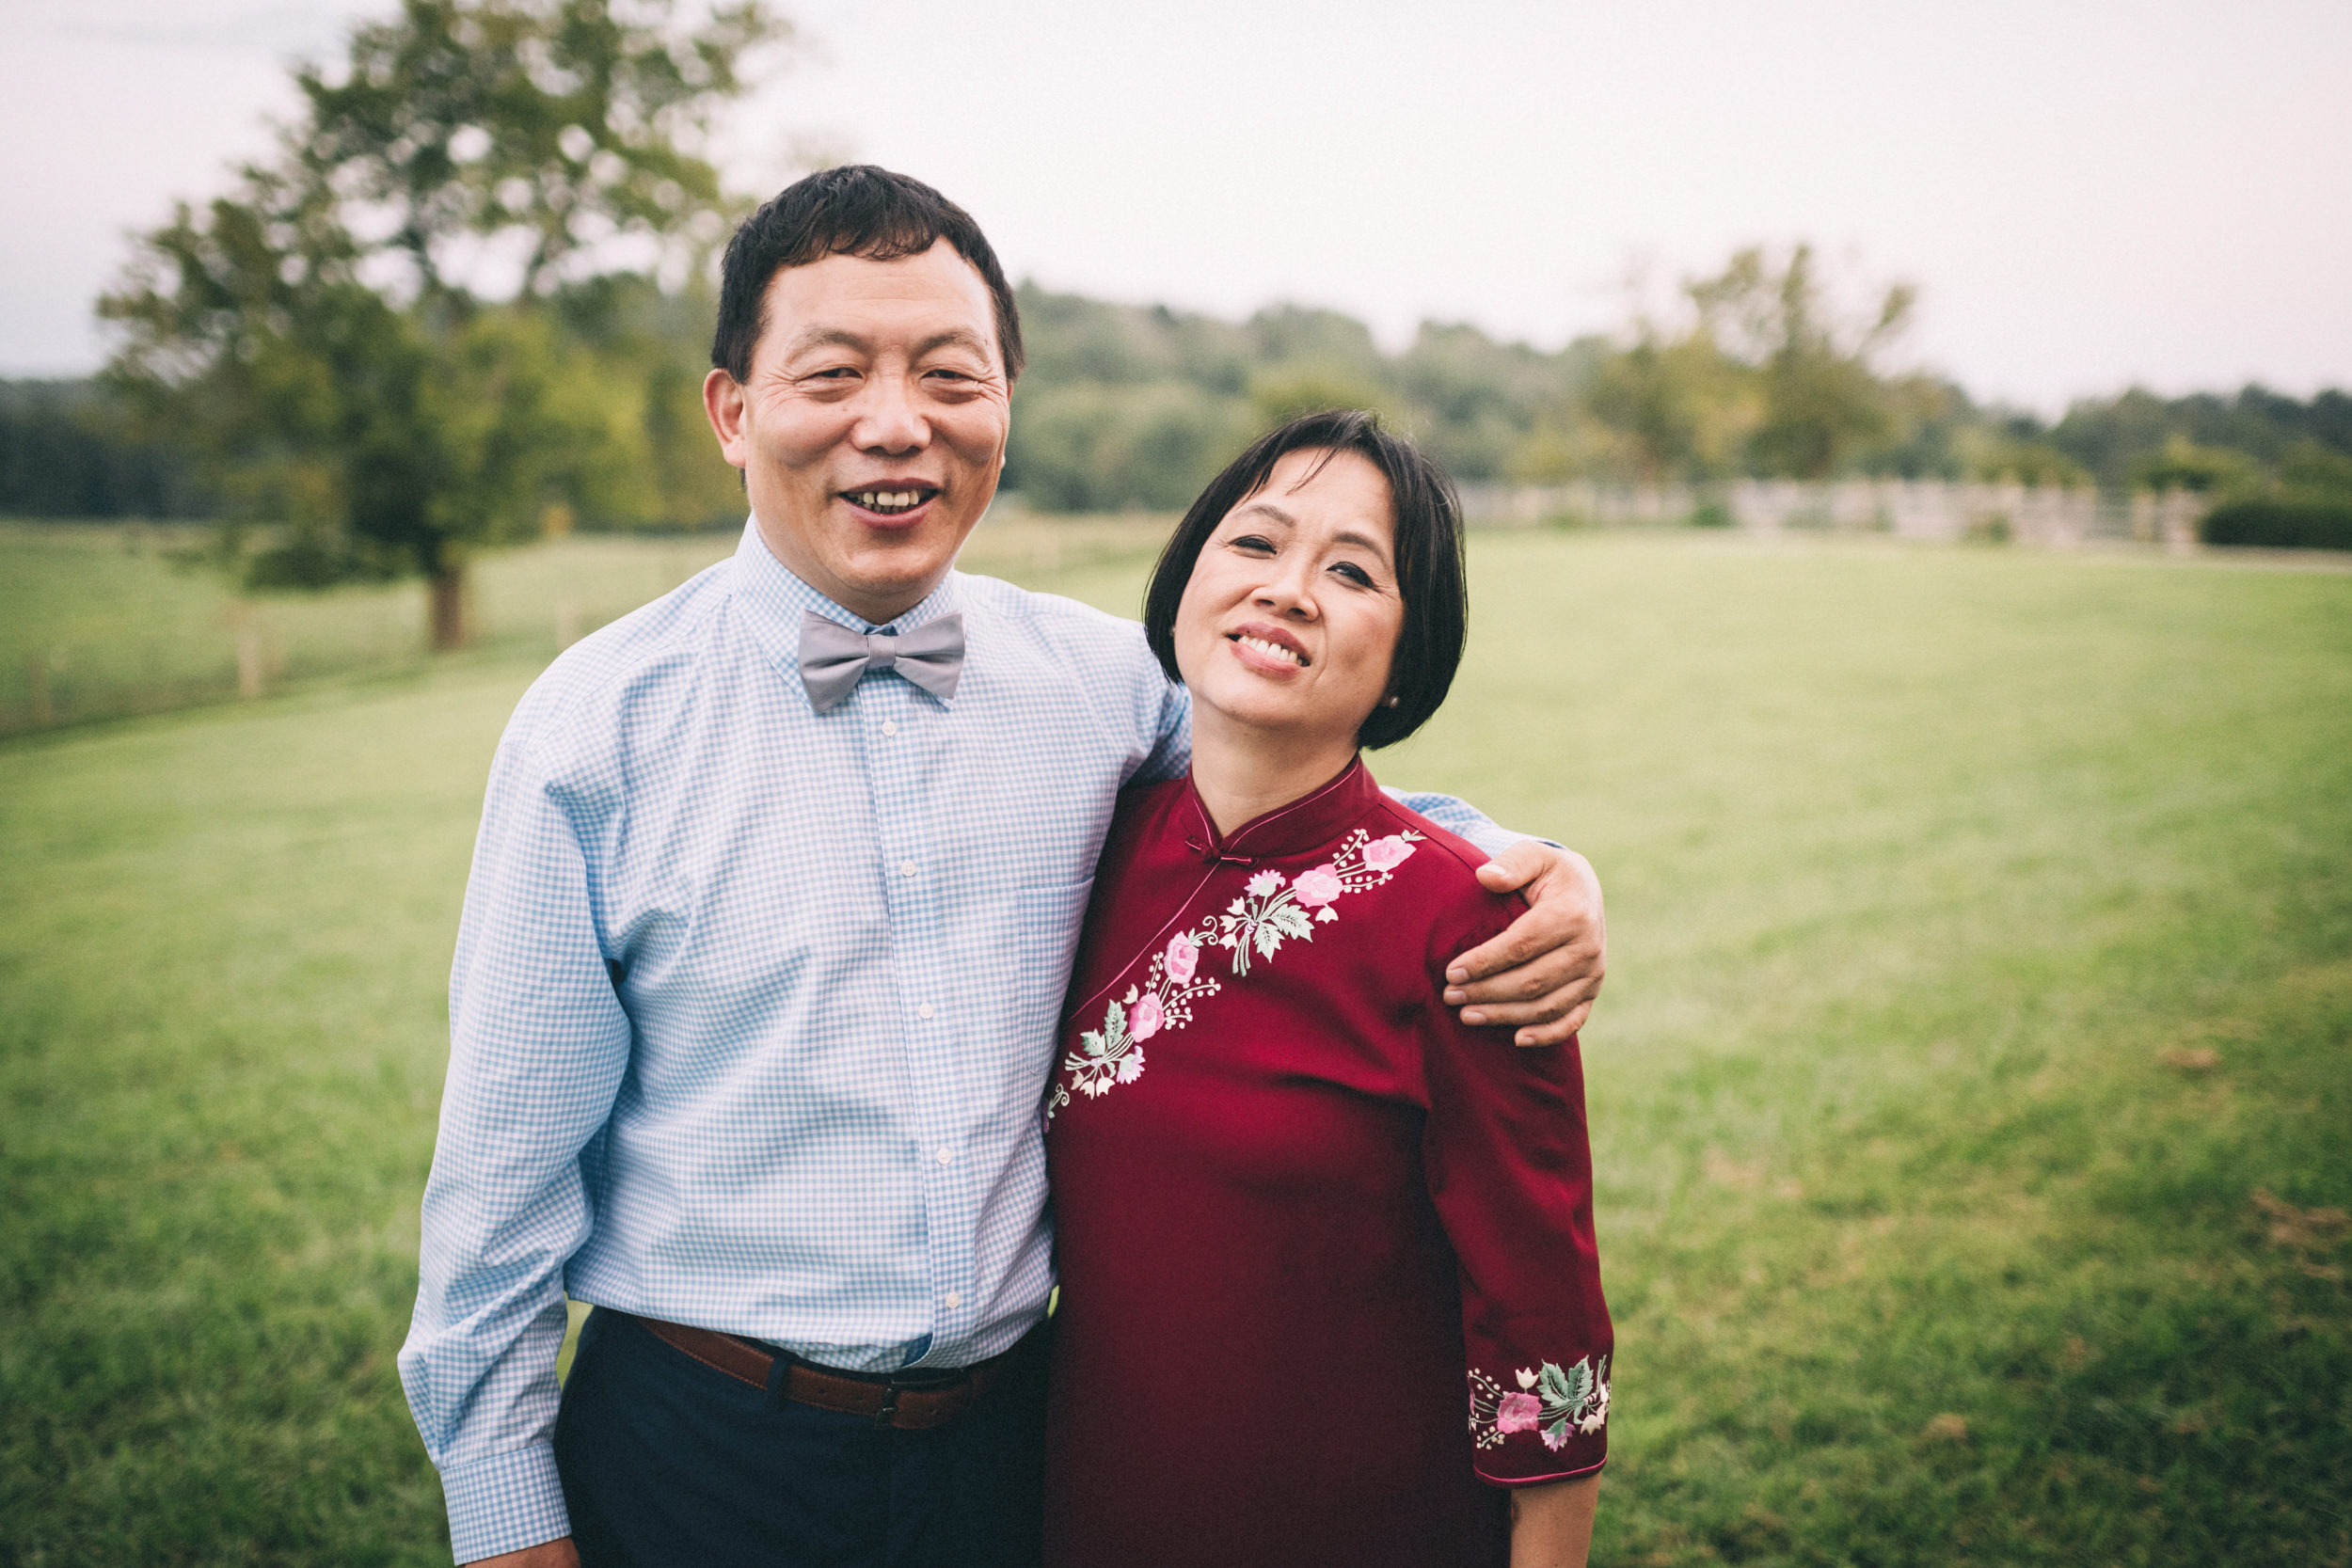 Louisville-Kentucky-Wedding-and-Elopement-Photographer-Sarah-Katherine-Davis-Photography-Summer-Jewel-Toned-Wedding-Chineese-Tea-Ceremony-Warrenwood-Manor-Danville-819.jpg